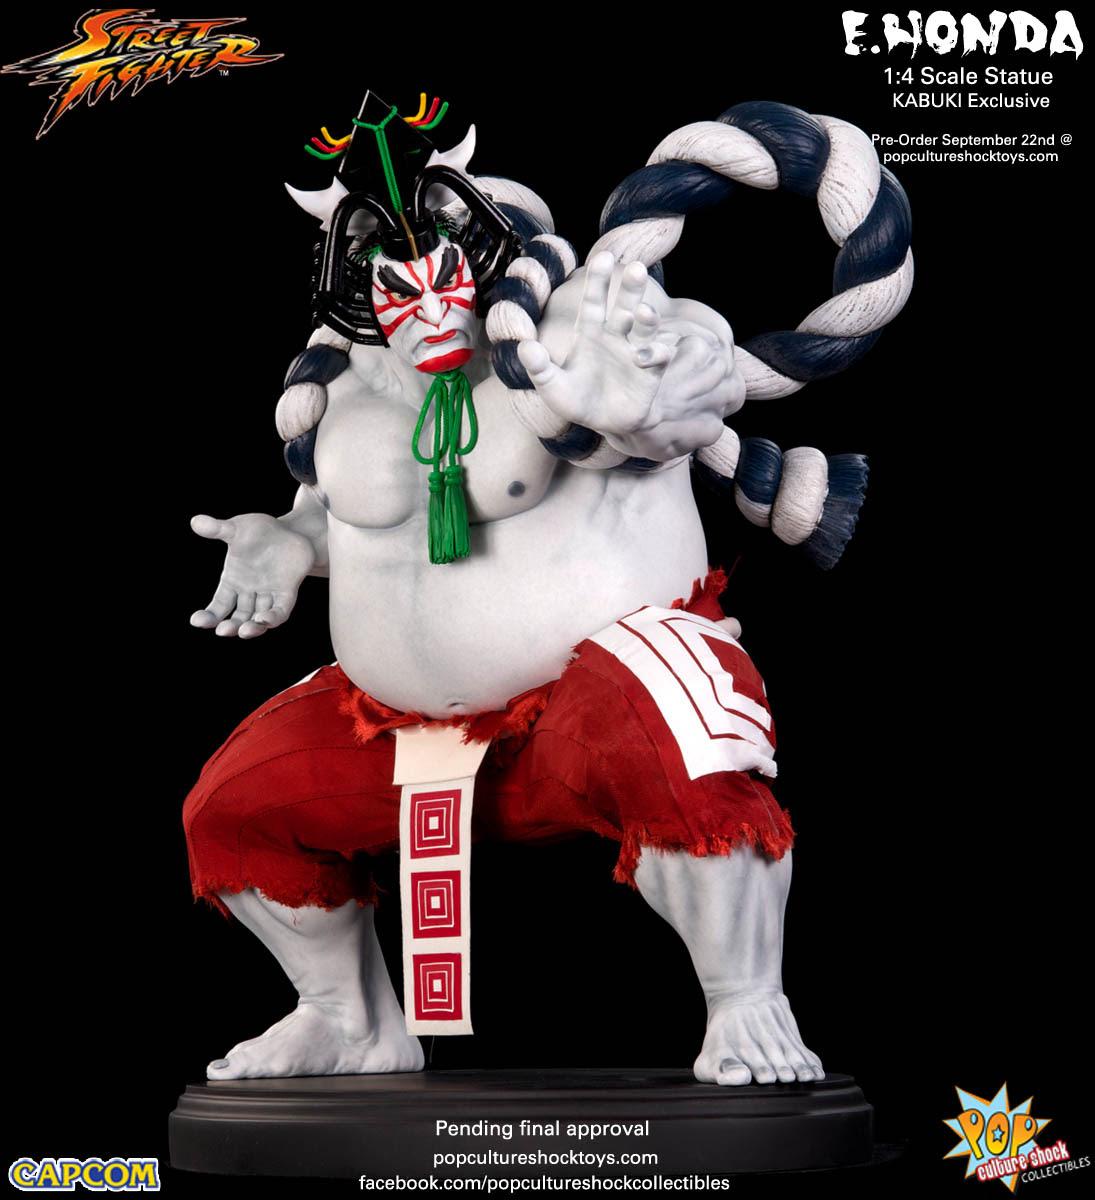 [Pop Culture Shock] Street Fighter: E. Honda 1/4 Statue - Página 3 Acafbdaf-2cf1-40b0-8fd0-732fdec0d7f2